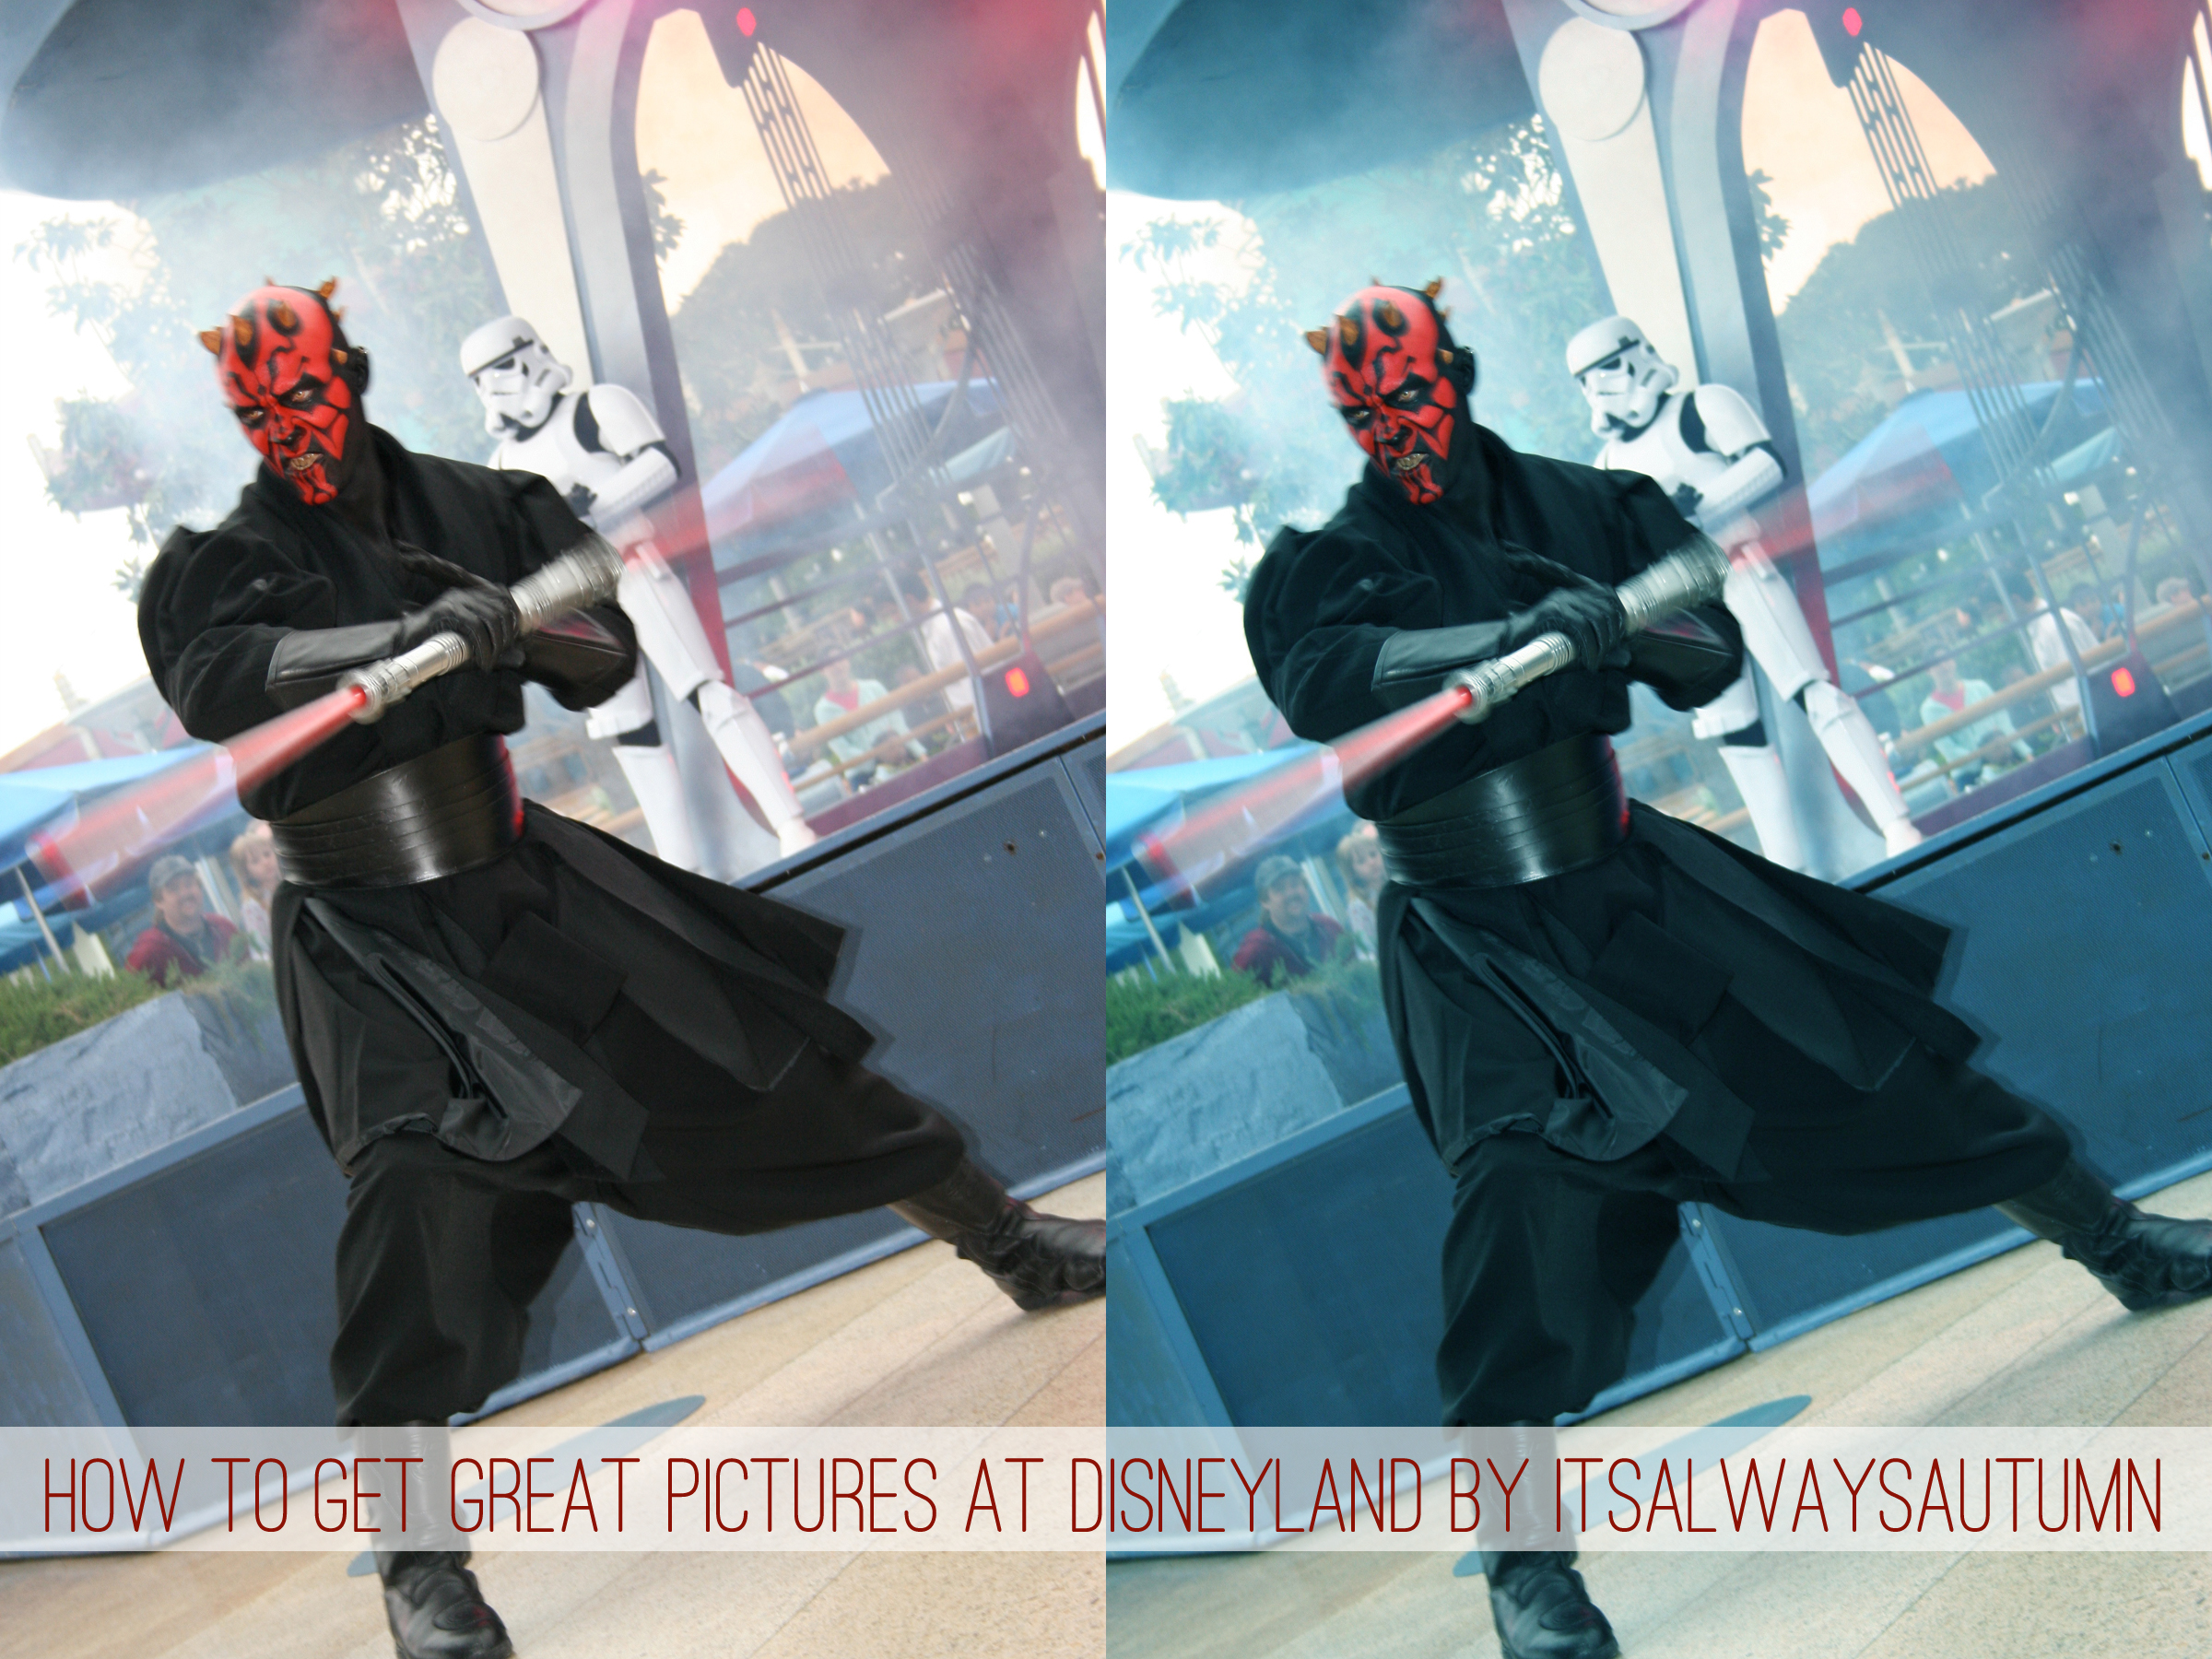 Disney week: Photo tips (plus how to capture motionblur)